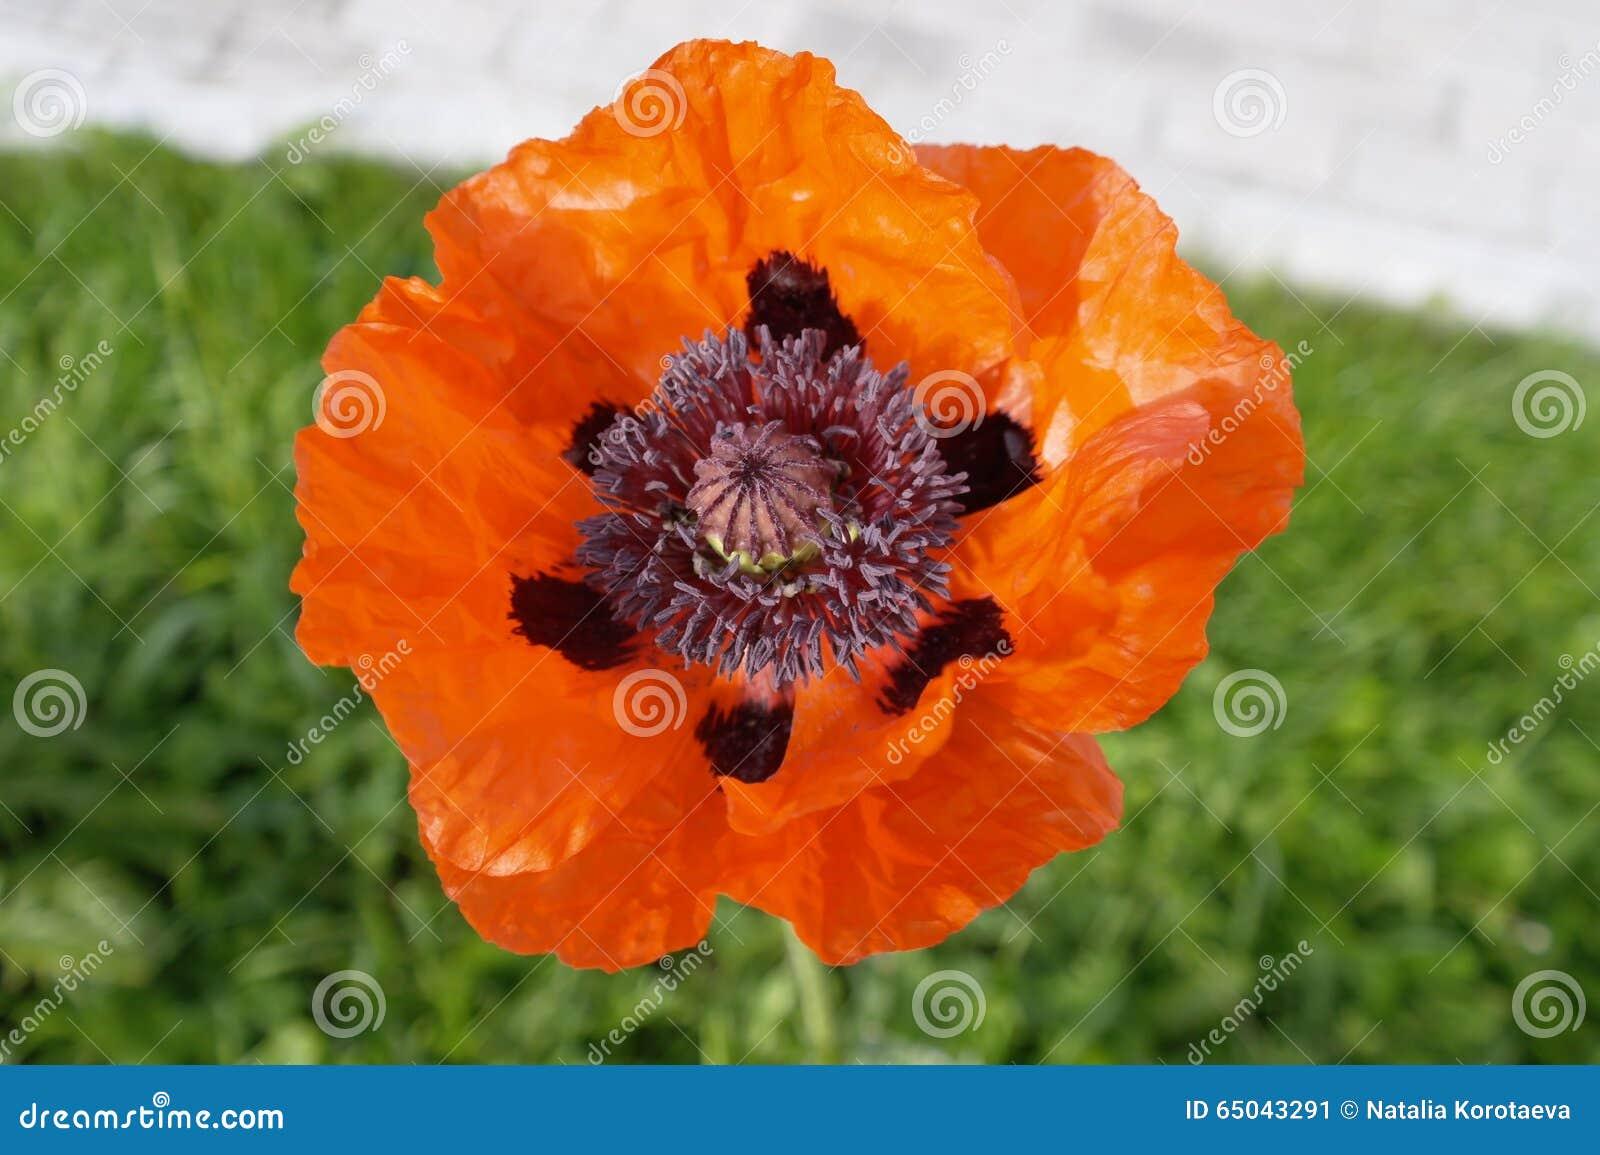 Open A Poppy Flower Stock Image Image Of Poppy Poppies 65043291